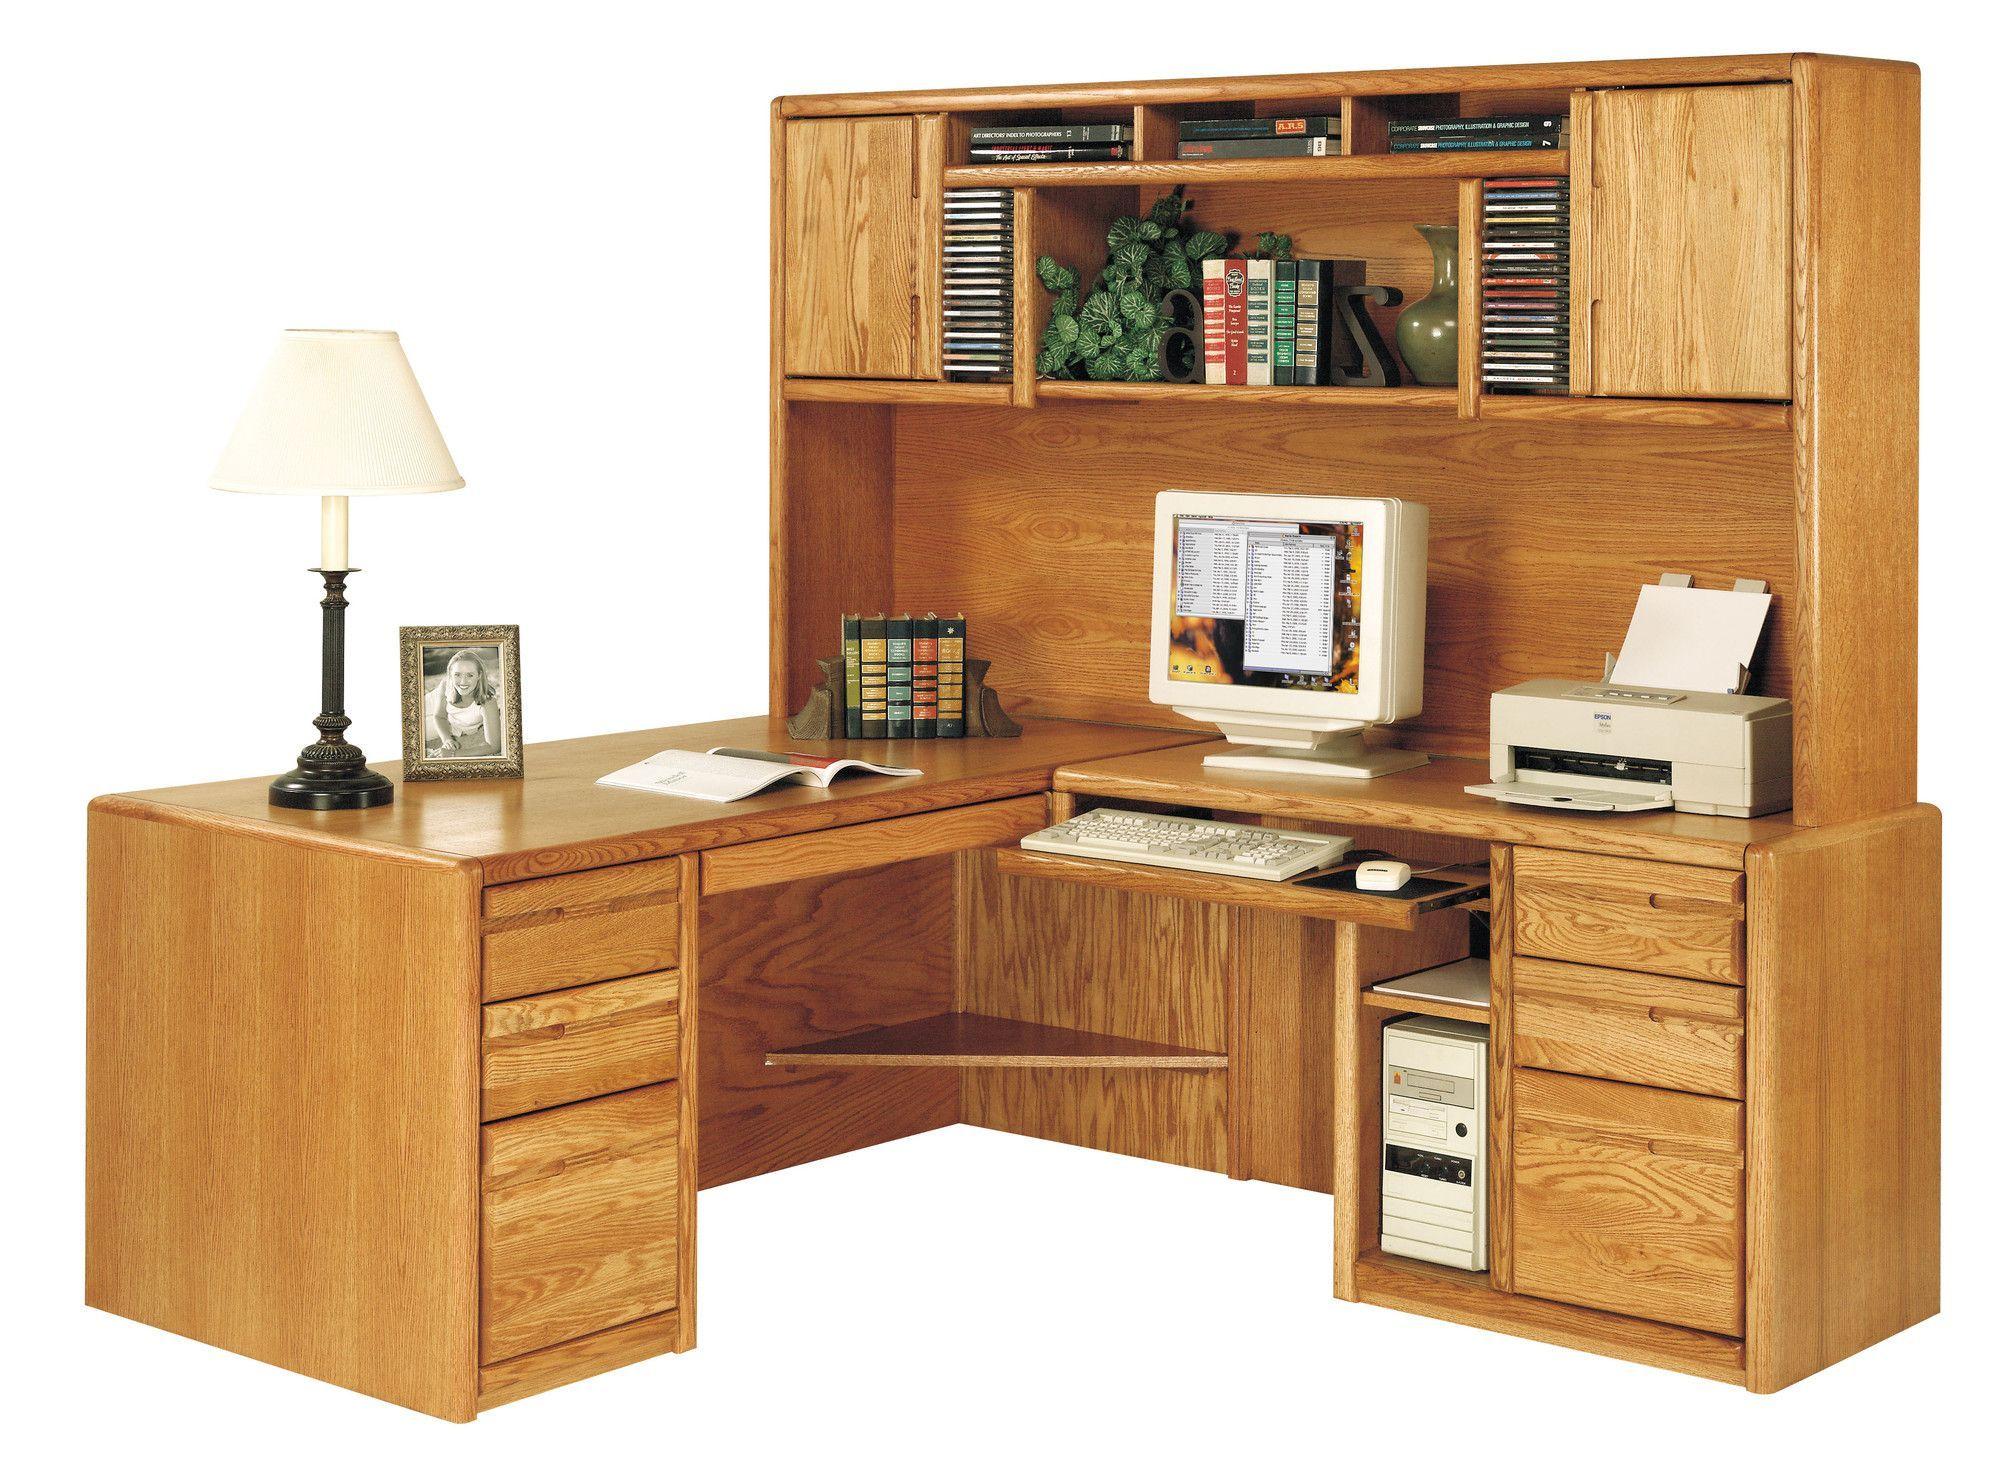 Admirable 42 75 H X 78 5 W Desk Hutch Products Desk Hutch Desk Home Interior And Landscaping Ponolsignezvosmurscom